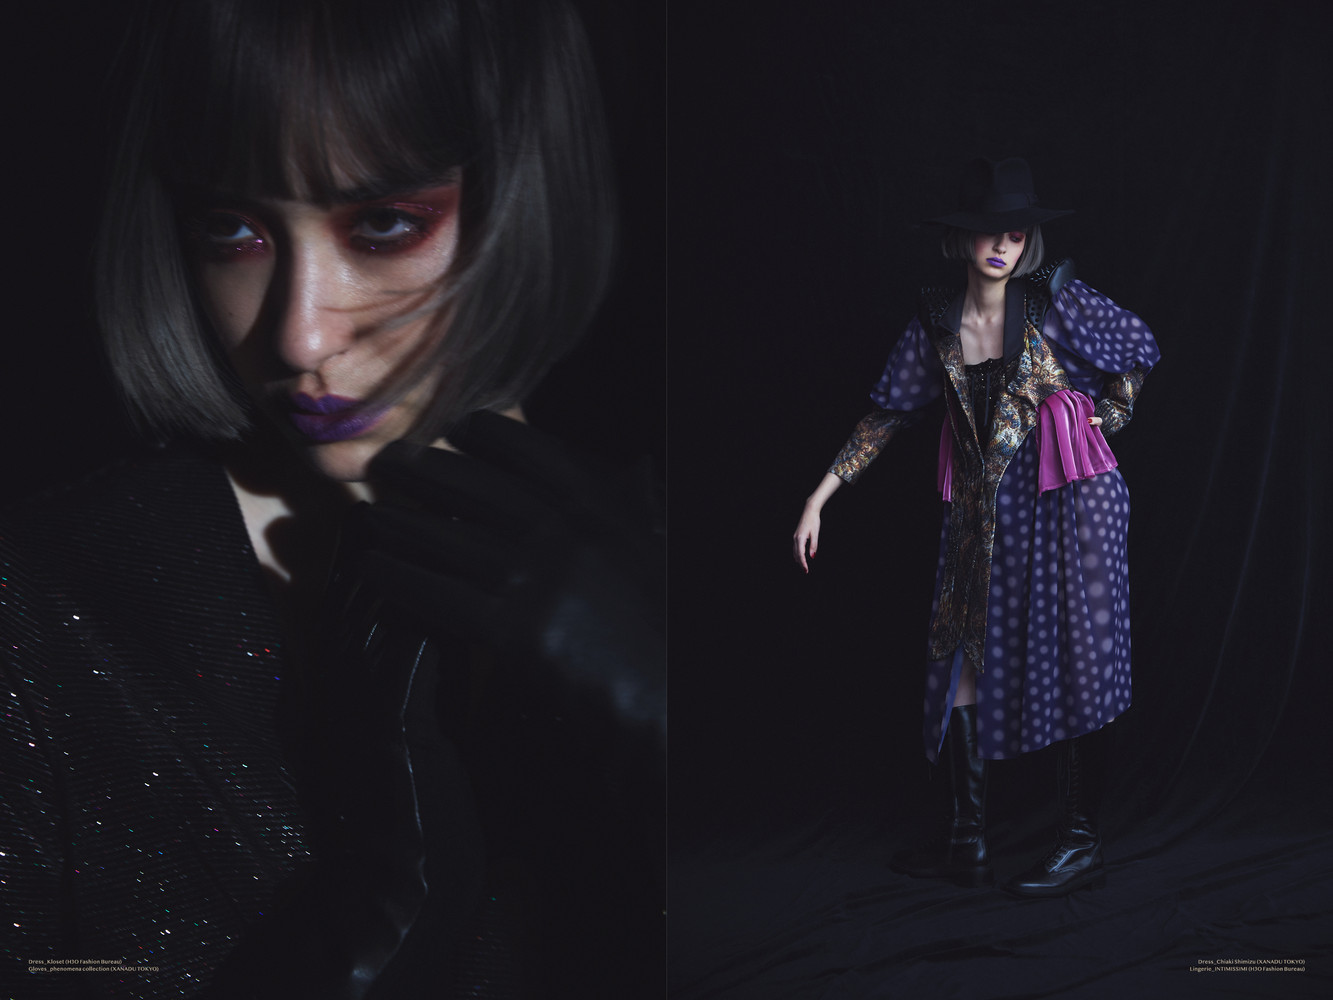 Left page: Dress_Kloset (H3O Fashion Bureau) Gloves_phenomena collection (XANADU TOKYO)  Right page: Dress_Chiaki Shimizu (XANADU TOKYO) Lingerie_INTIMISSIMI (H3O Fashion Bureau)